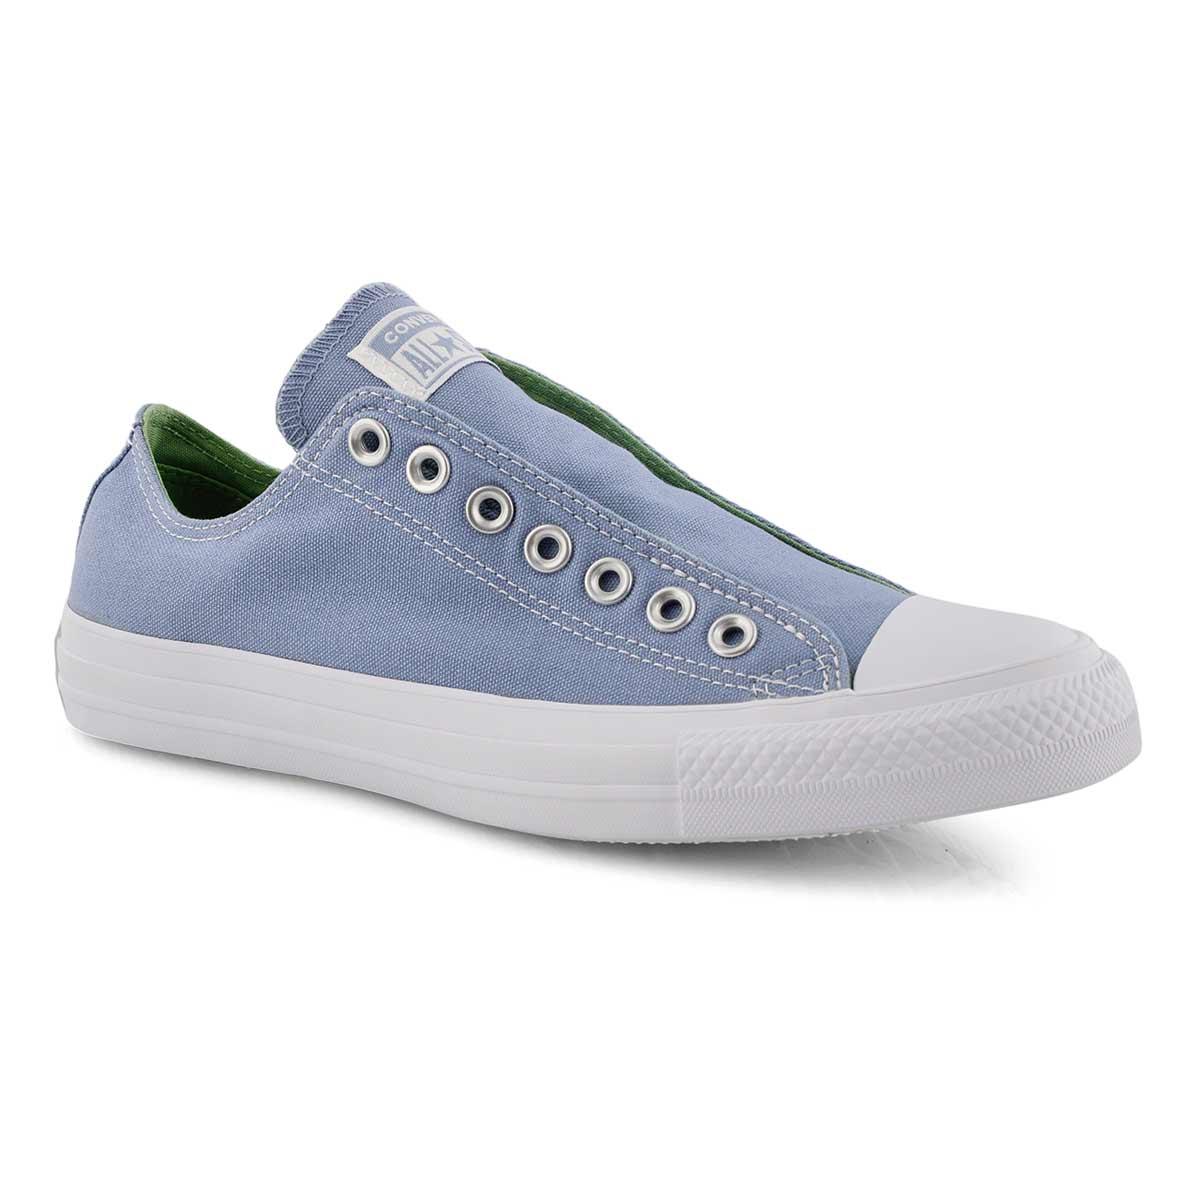 Converse-Women-039-s-Chuck-Taylor-All-Star-Slip-Fashion-Sneaker miniature 15